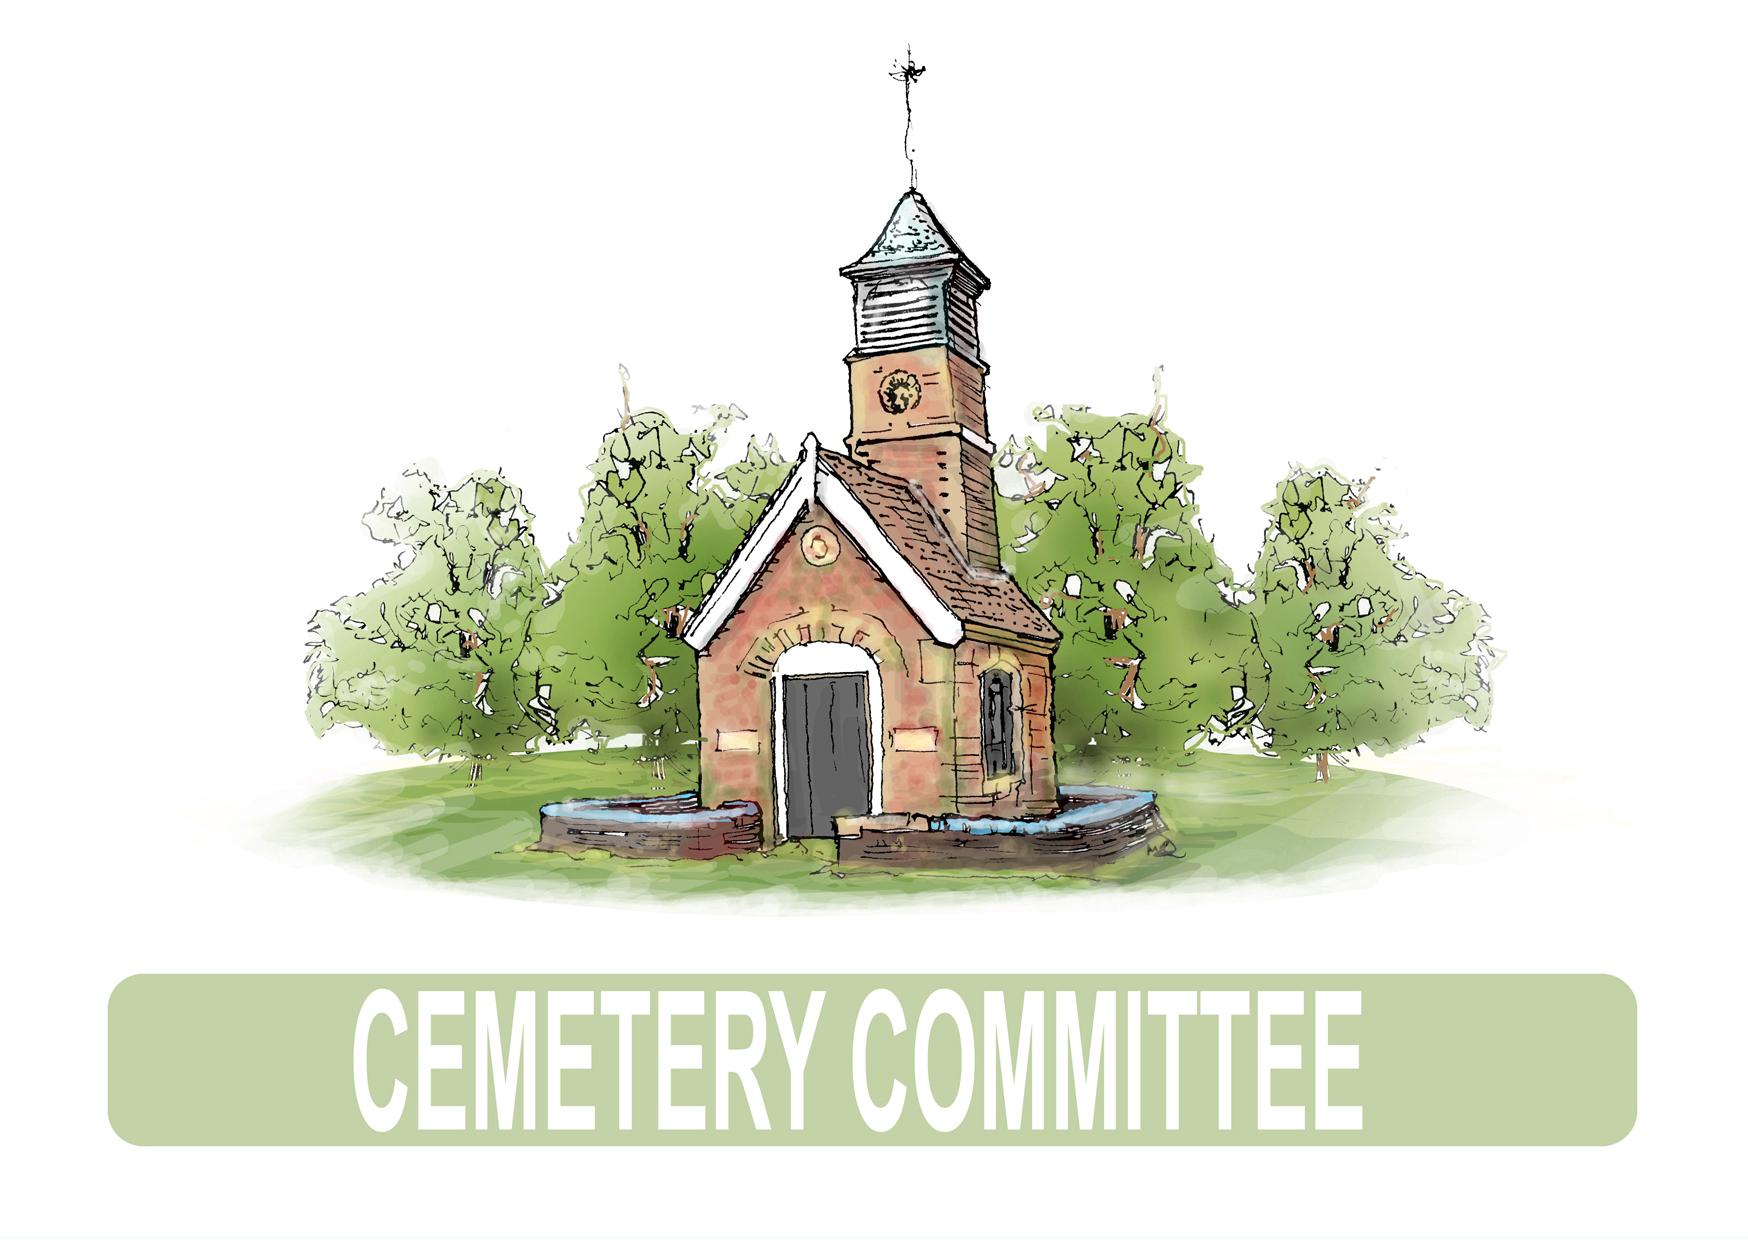 Cemetery Committee logo